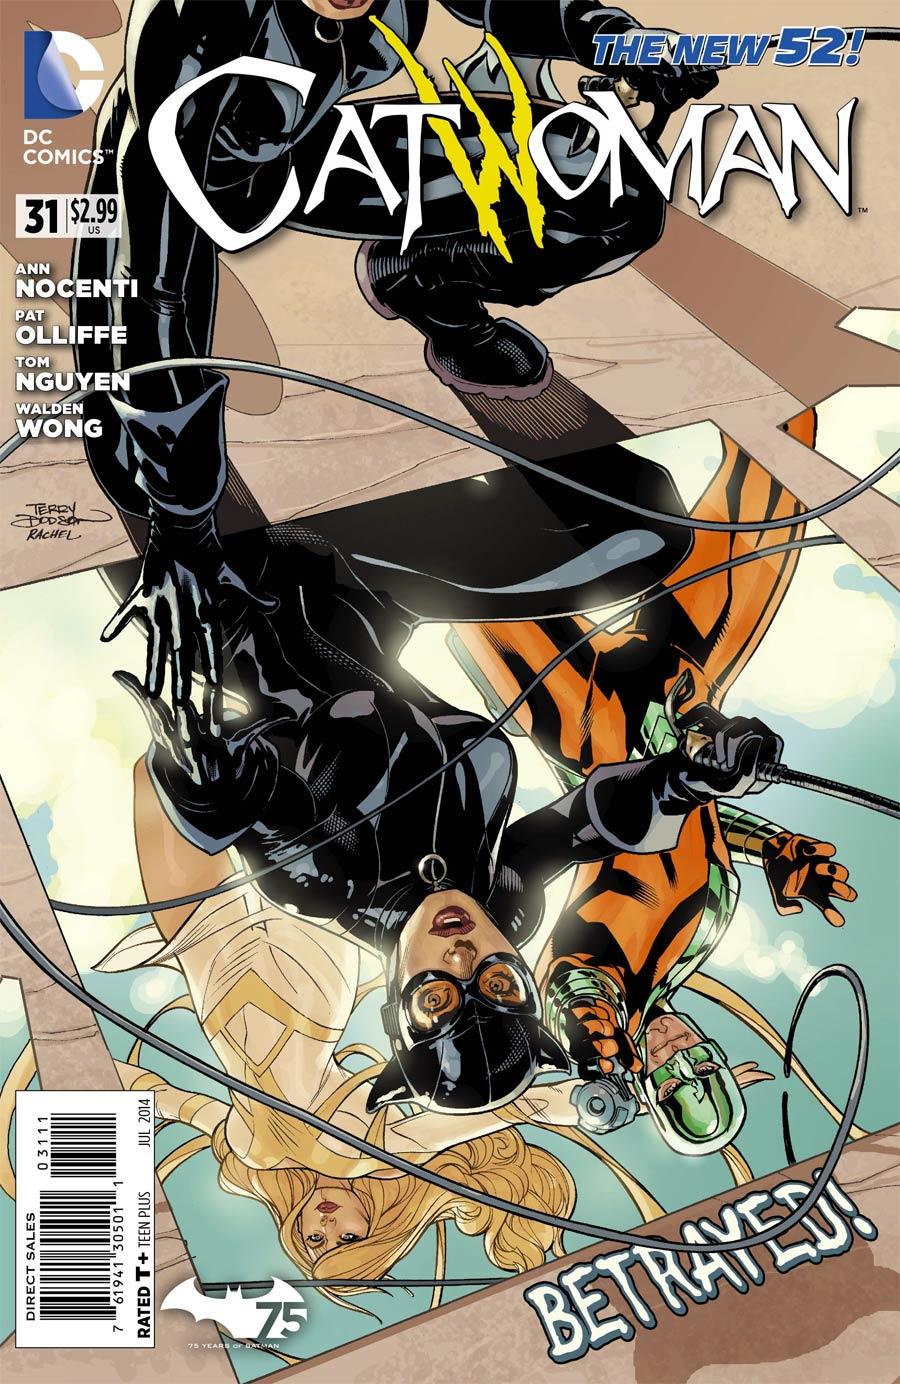 Catwoman Vol 4 #31